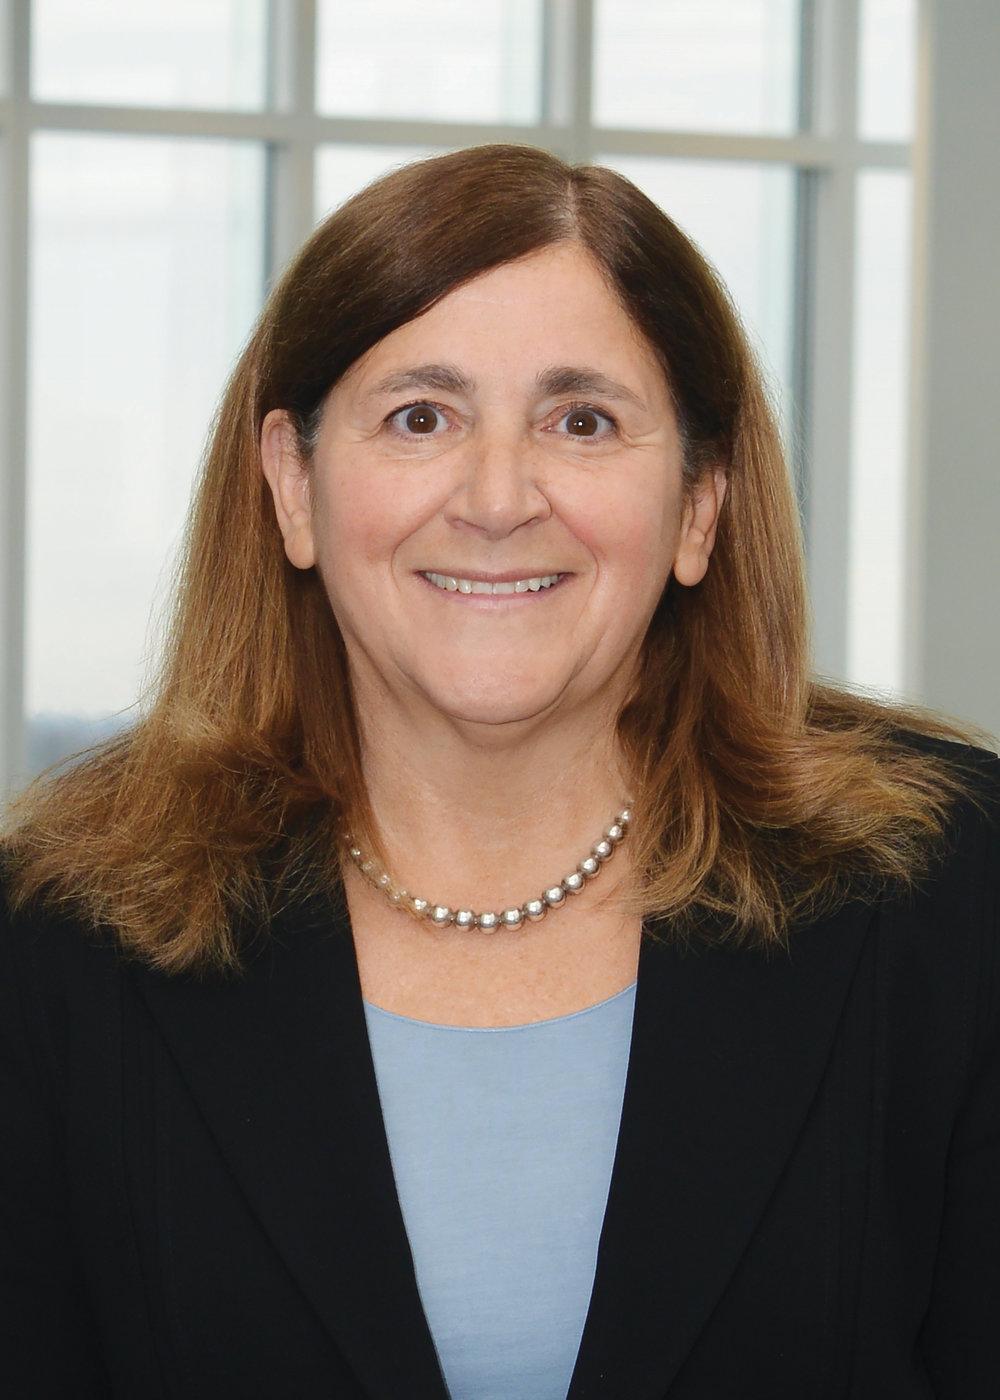 Gracia C. Martore President & CEO, TEGNA Inc.